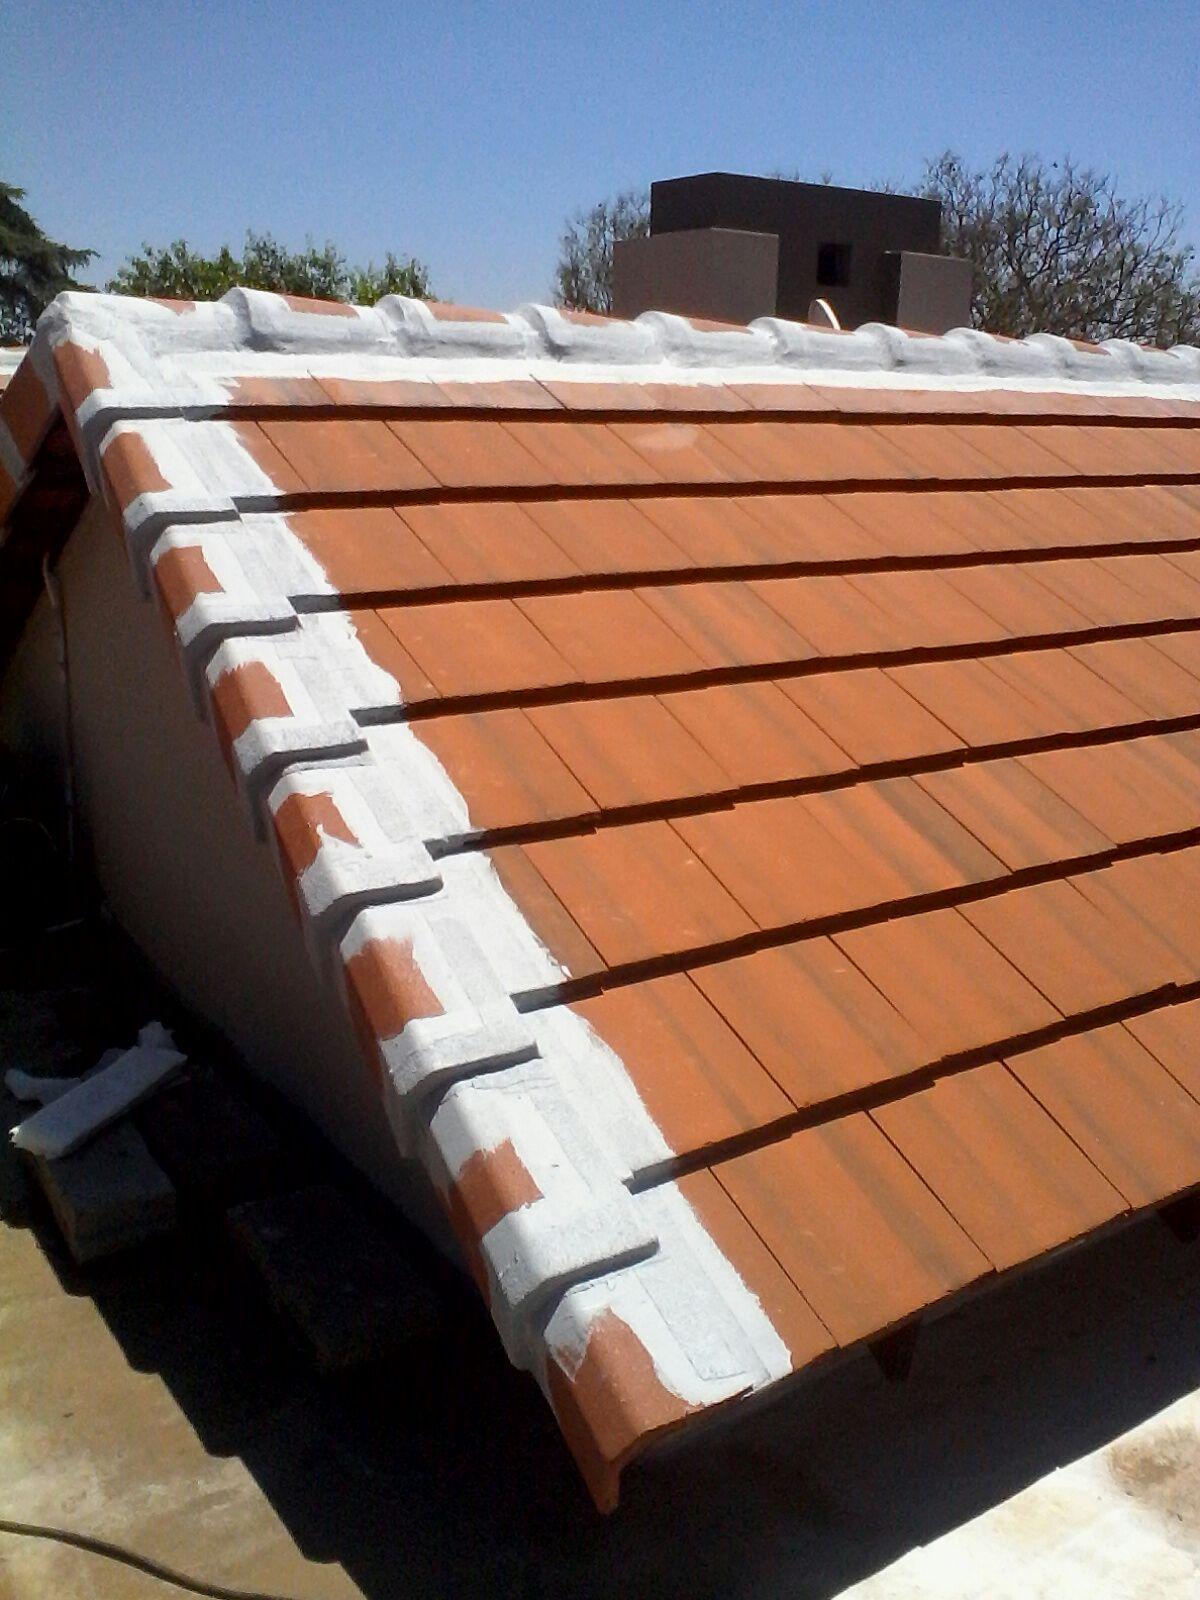 Waterproofing-in-process-on-Tile-Roofs.jpg